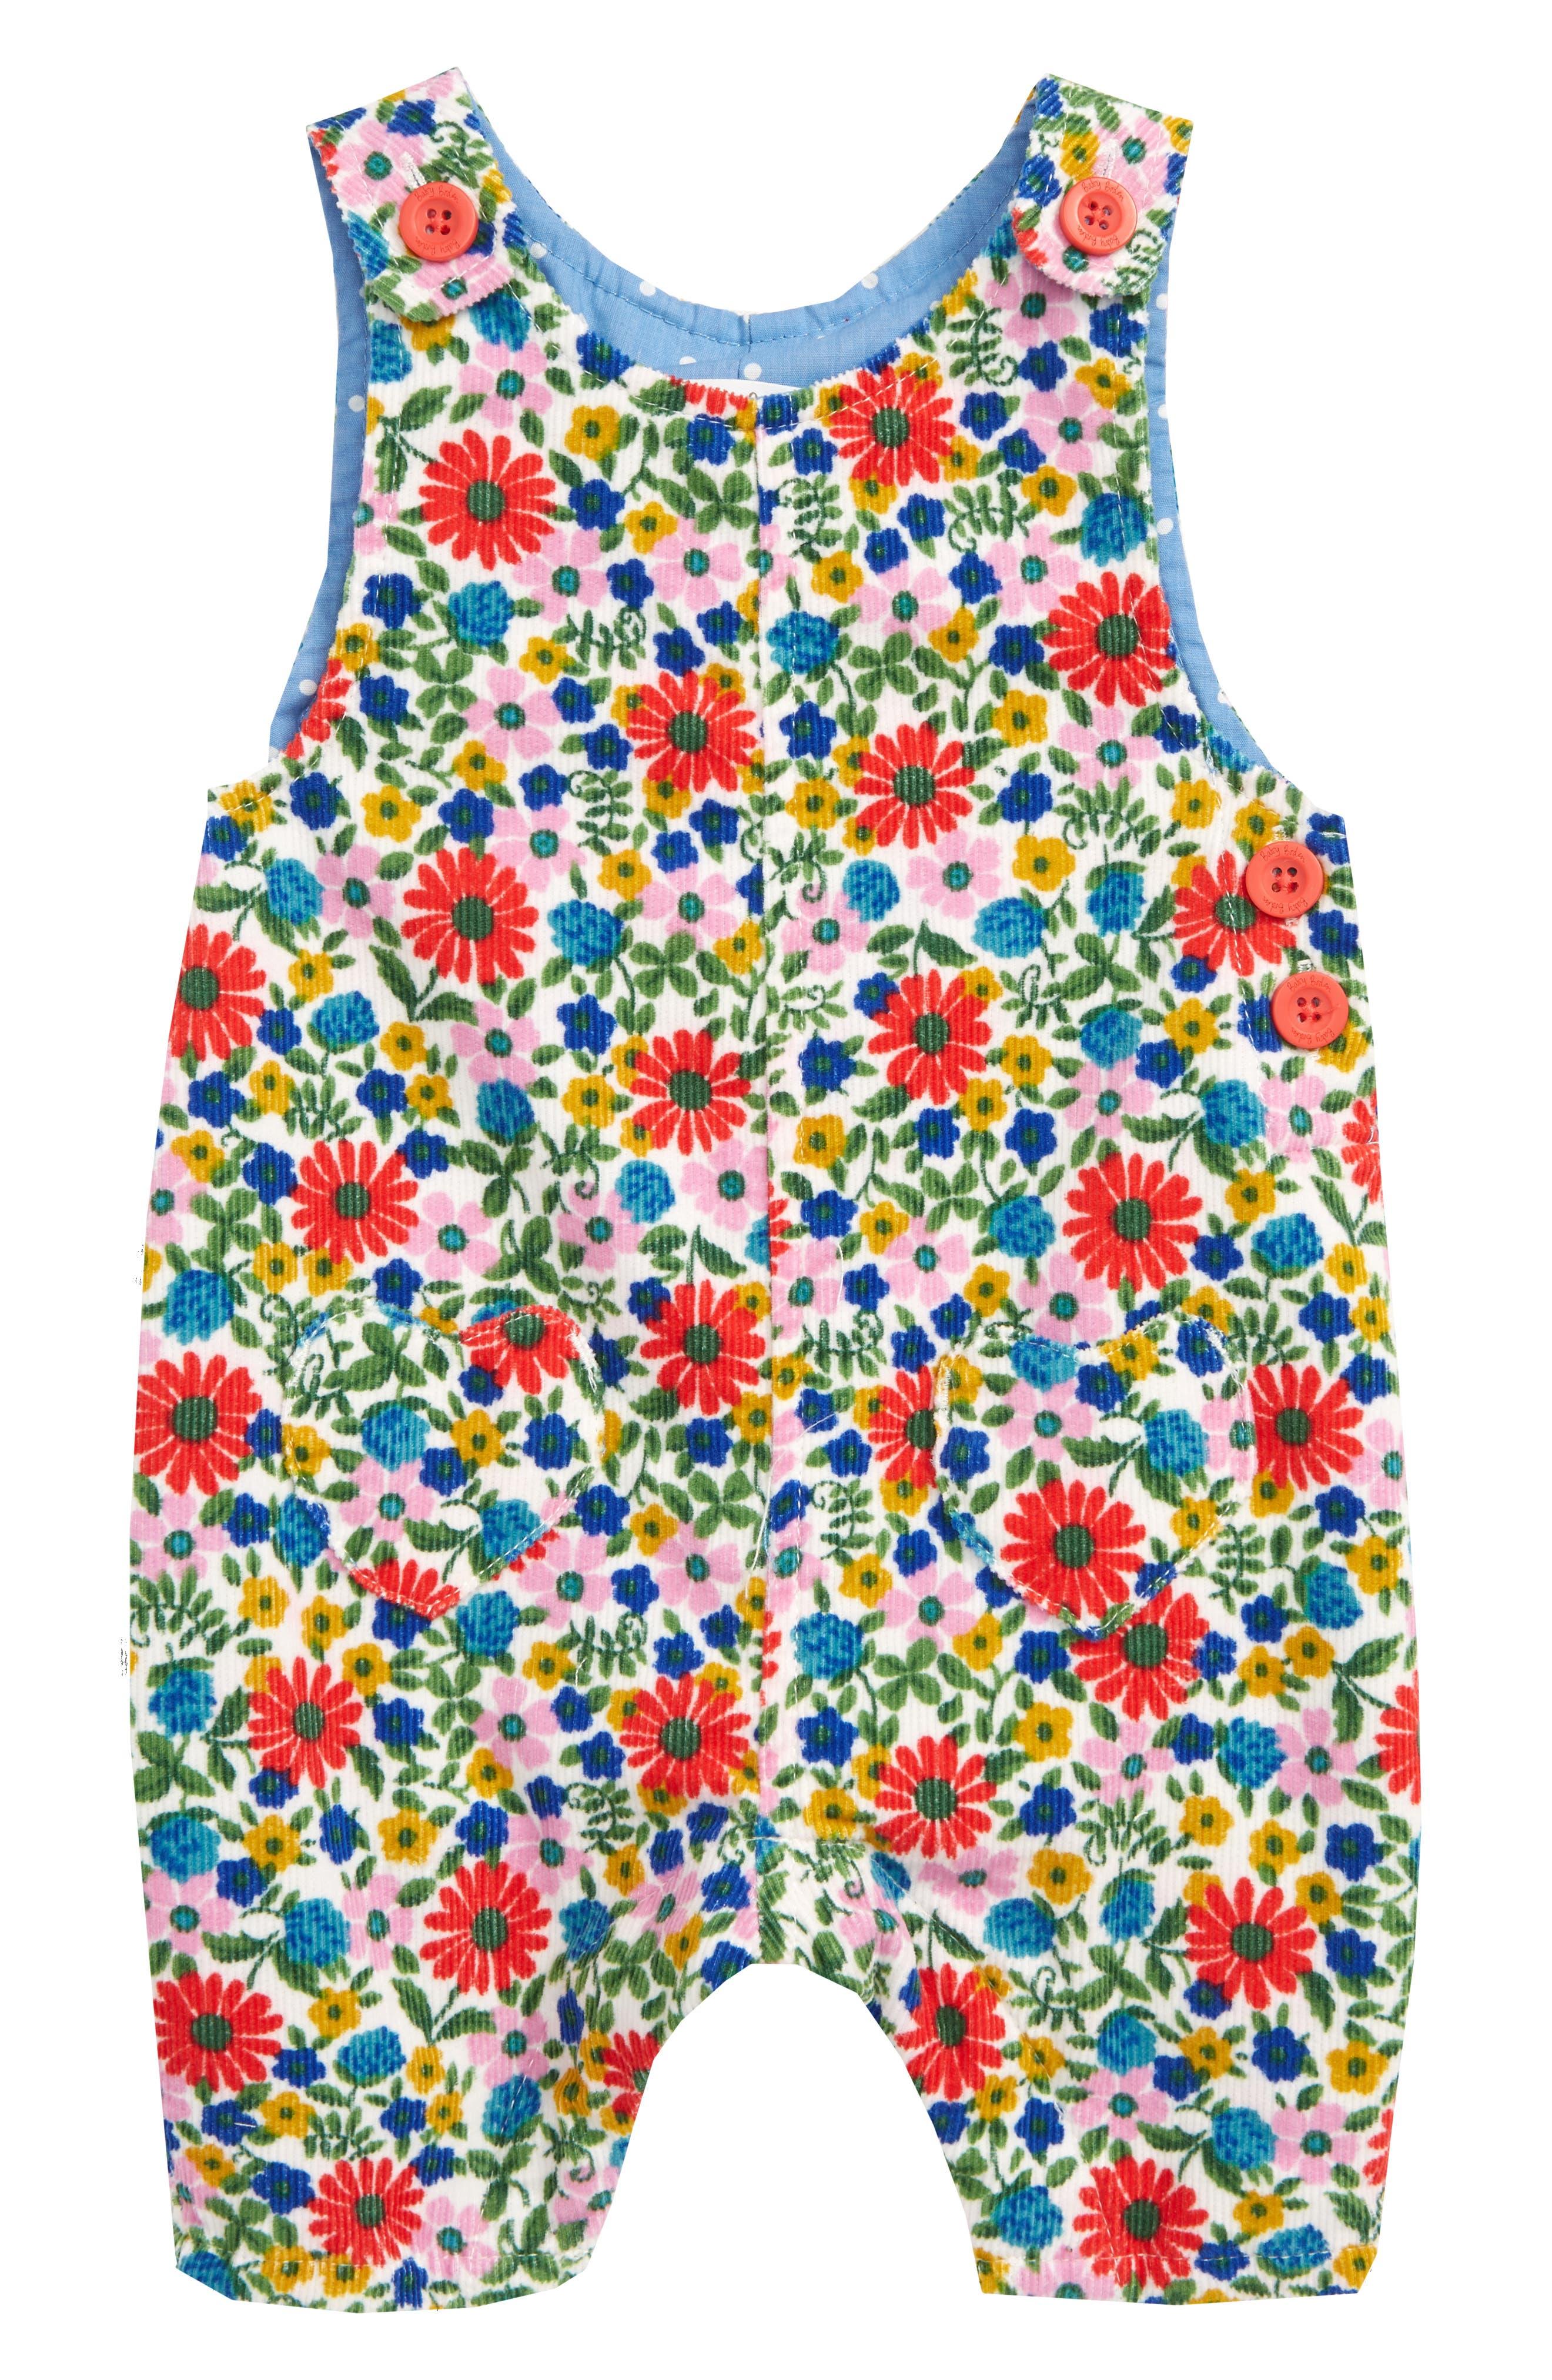 Toddler Girls Mini Boden Heart Pocket Romper Size 23Y  Blue